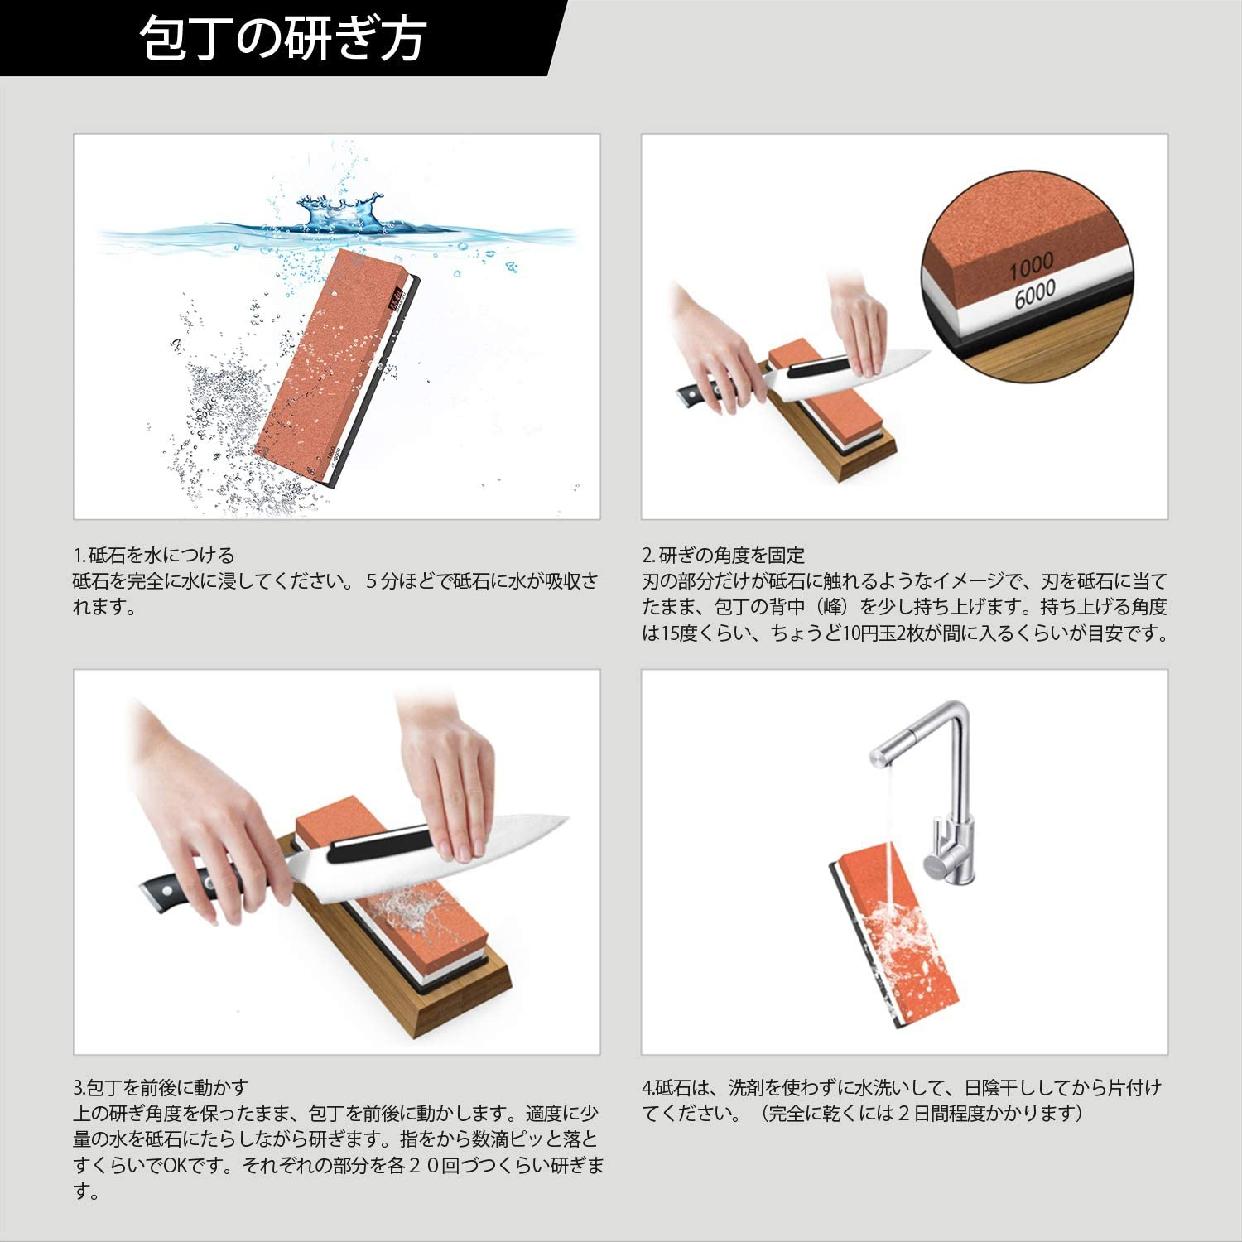 SHAN ZU 両面砥石 #1000/#6000 21.5 x 9.5 x 5.5 cmの商品画像3